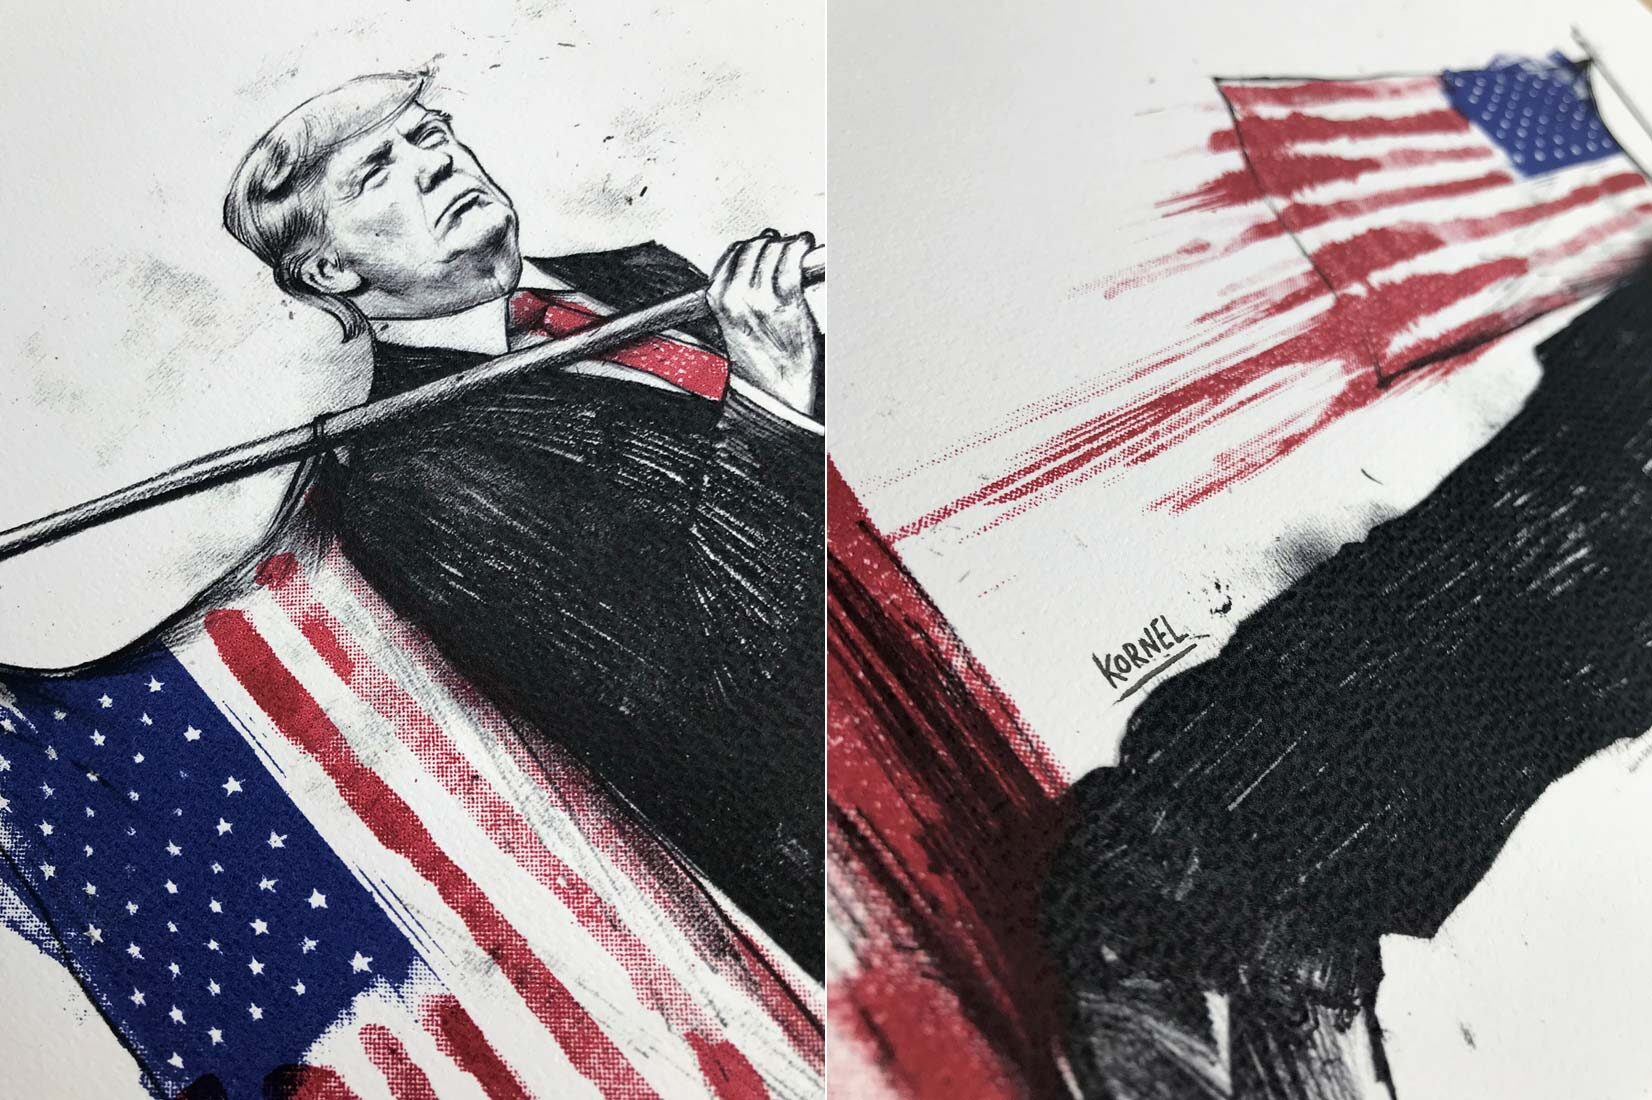 Bloodymerica 2 - Kornel Illustration | Kornel Stadler portfolio